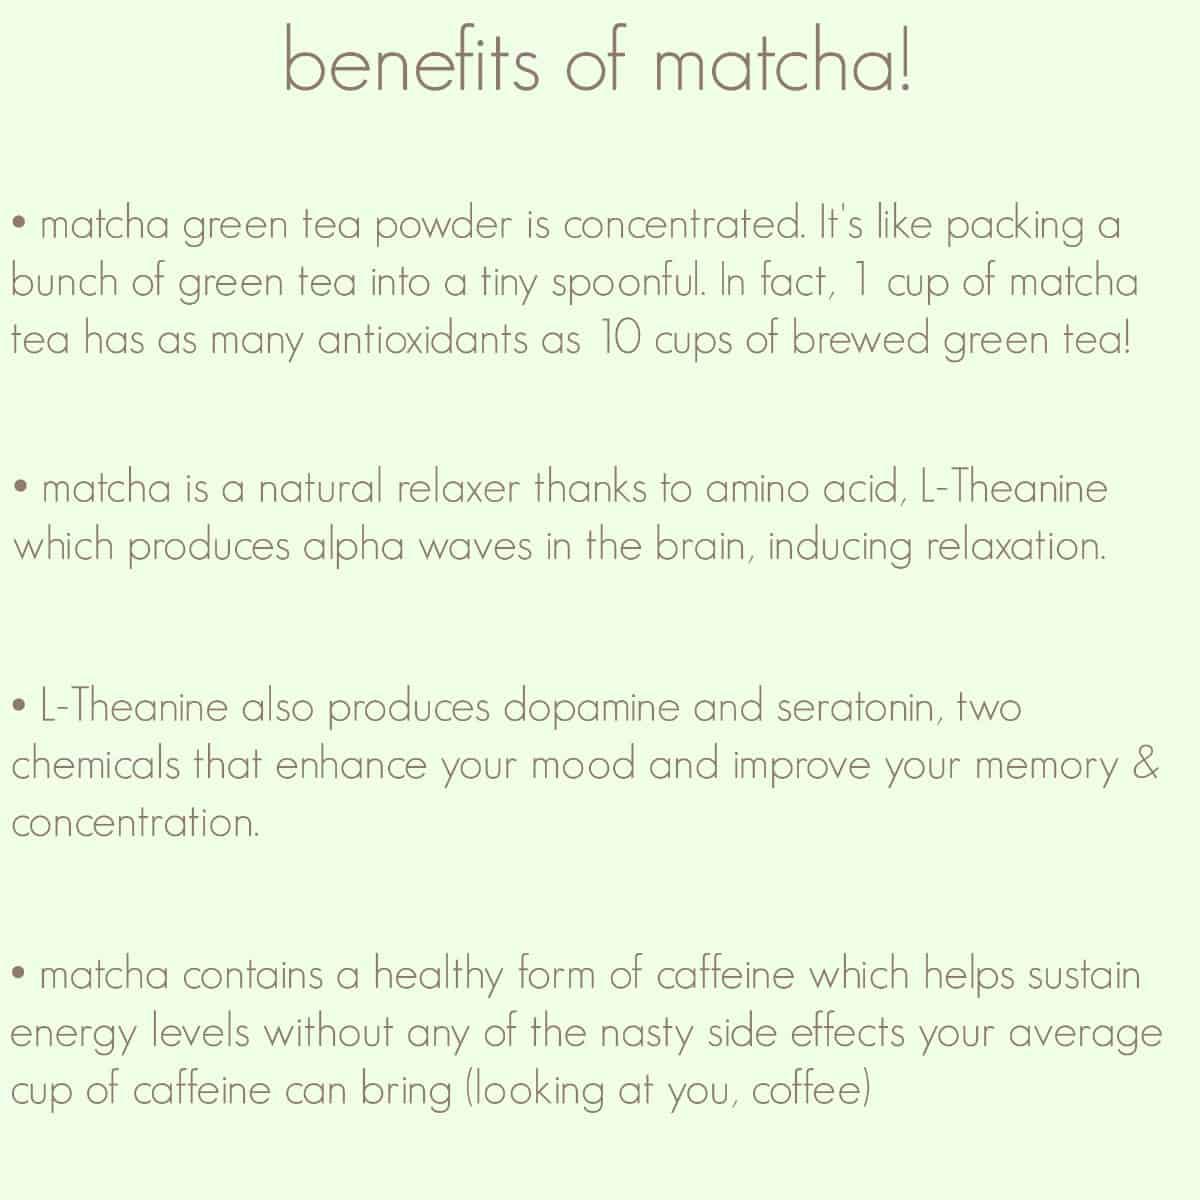 Benefits of matcha